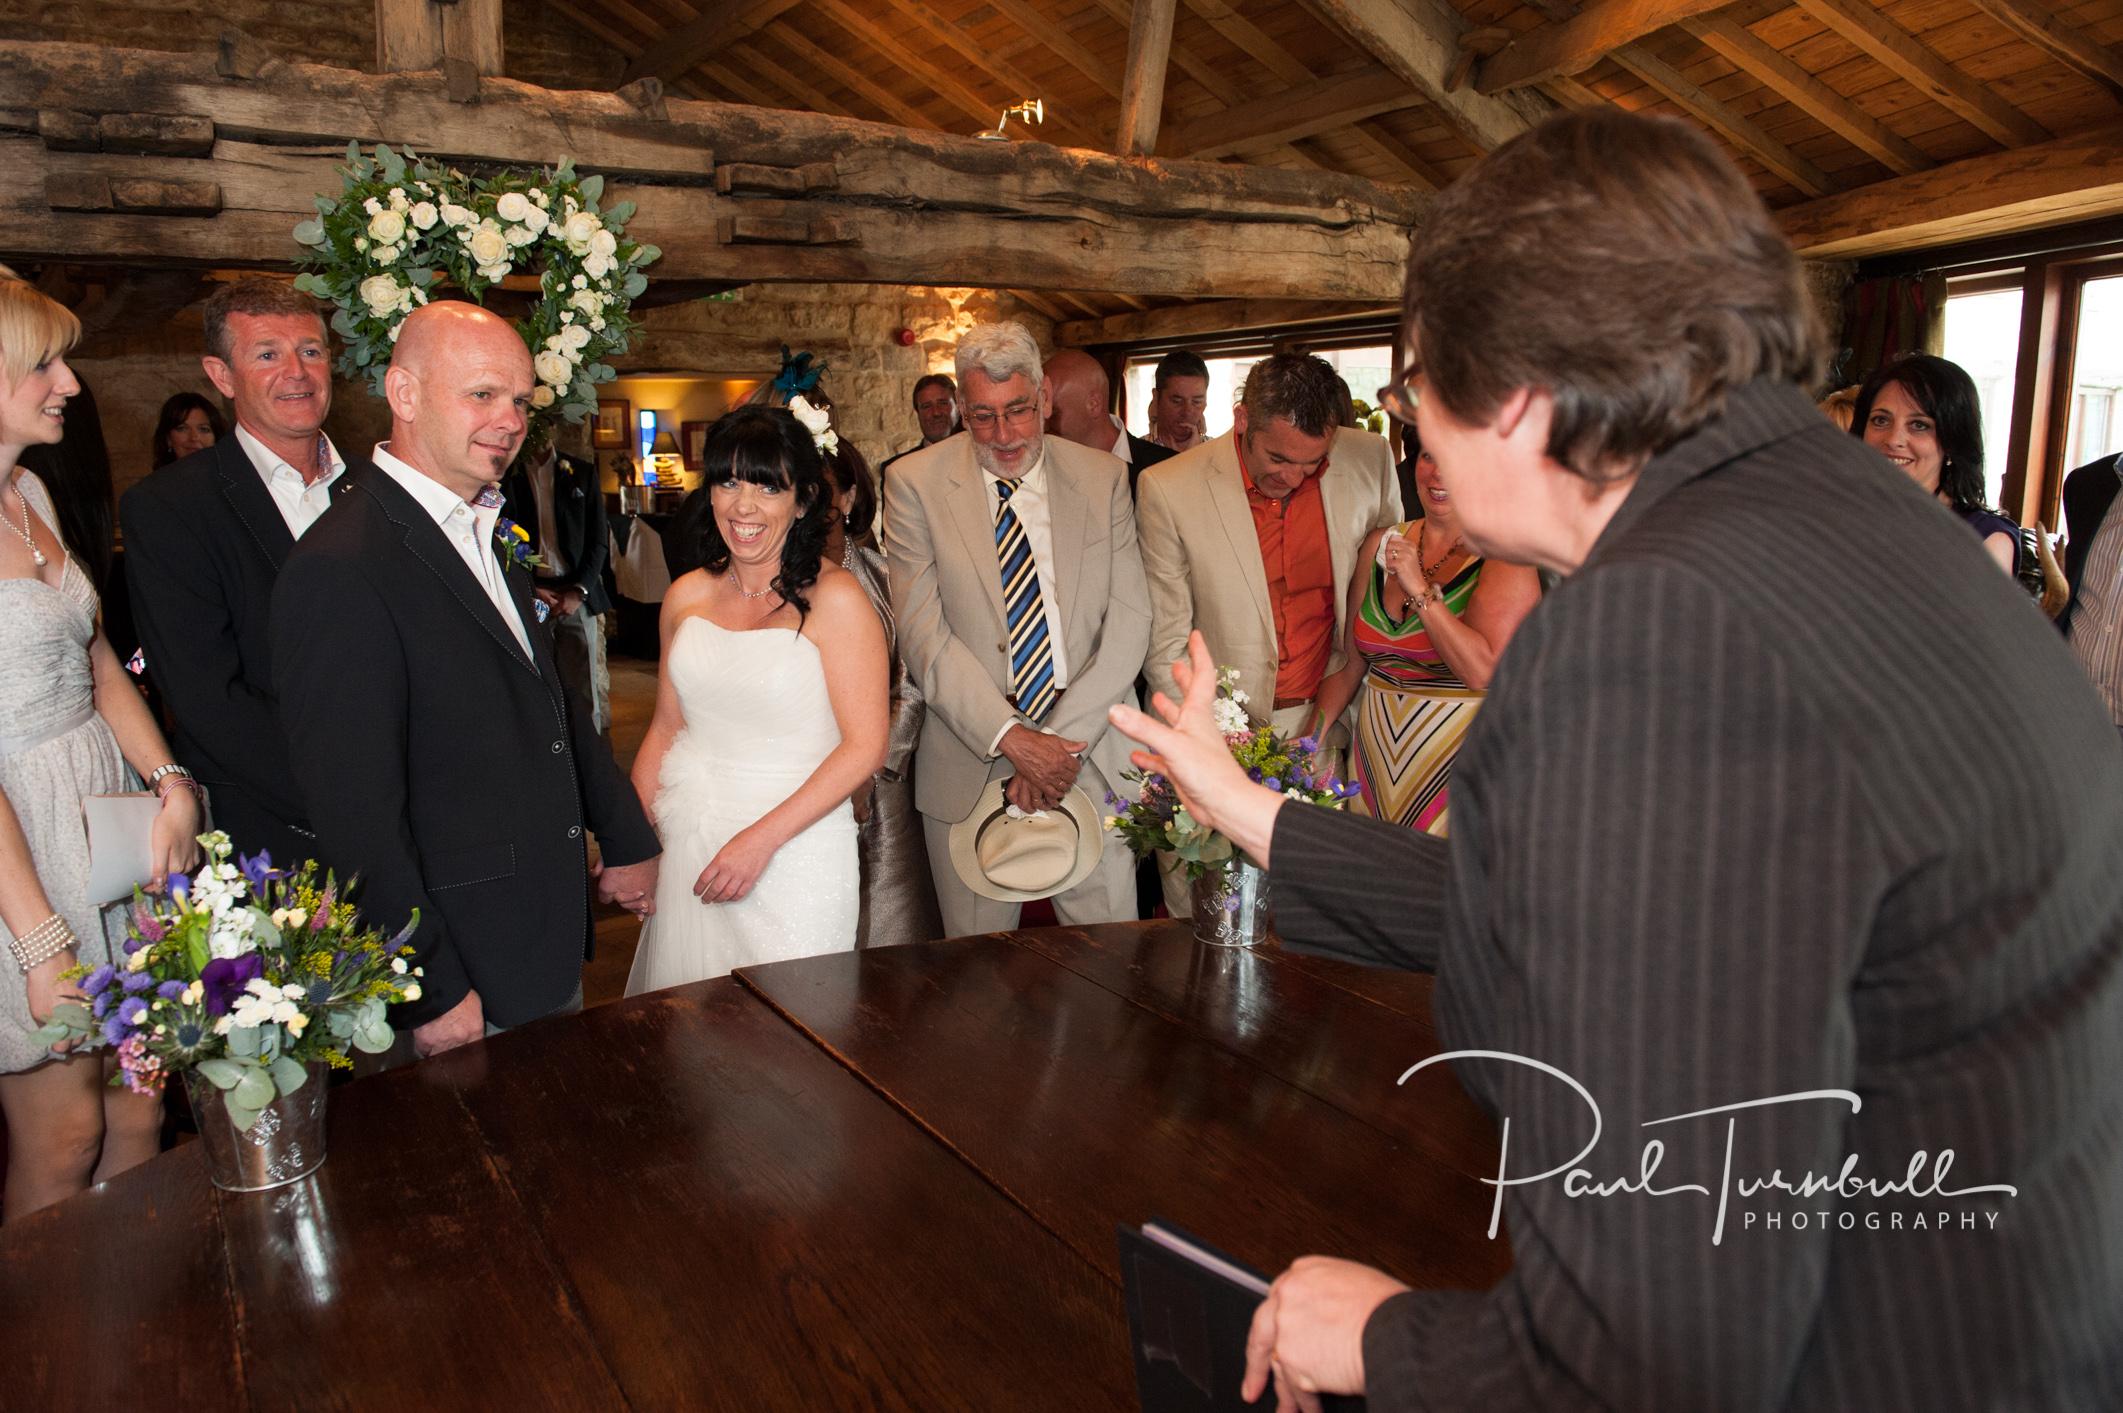 wedding-photography-star-inn-harome-yorkshire-012.jpg